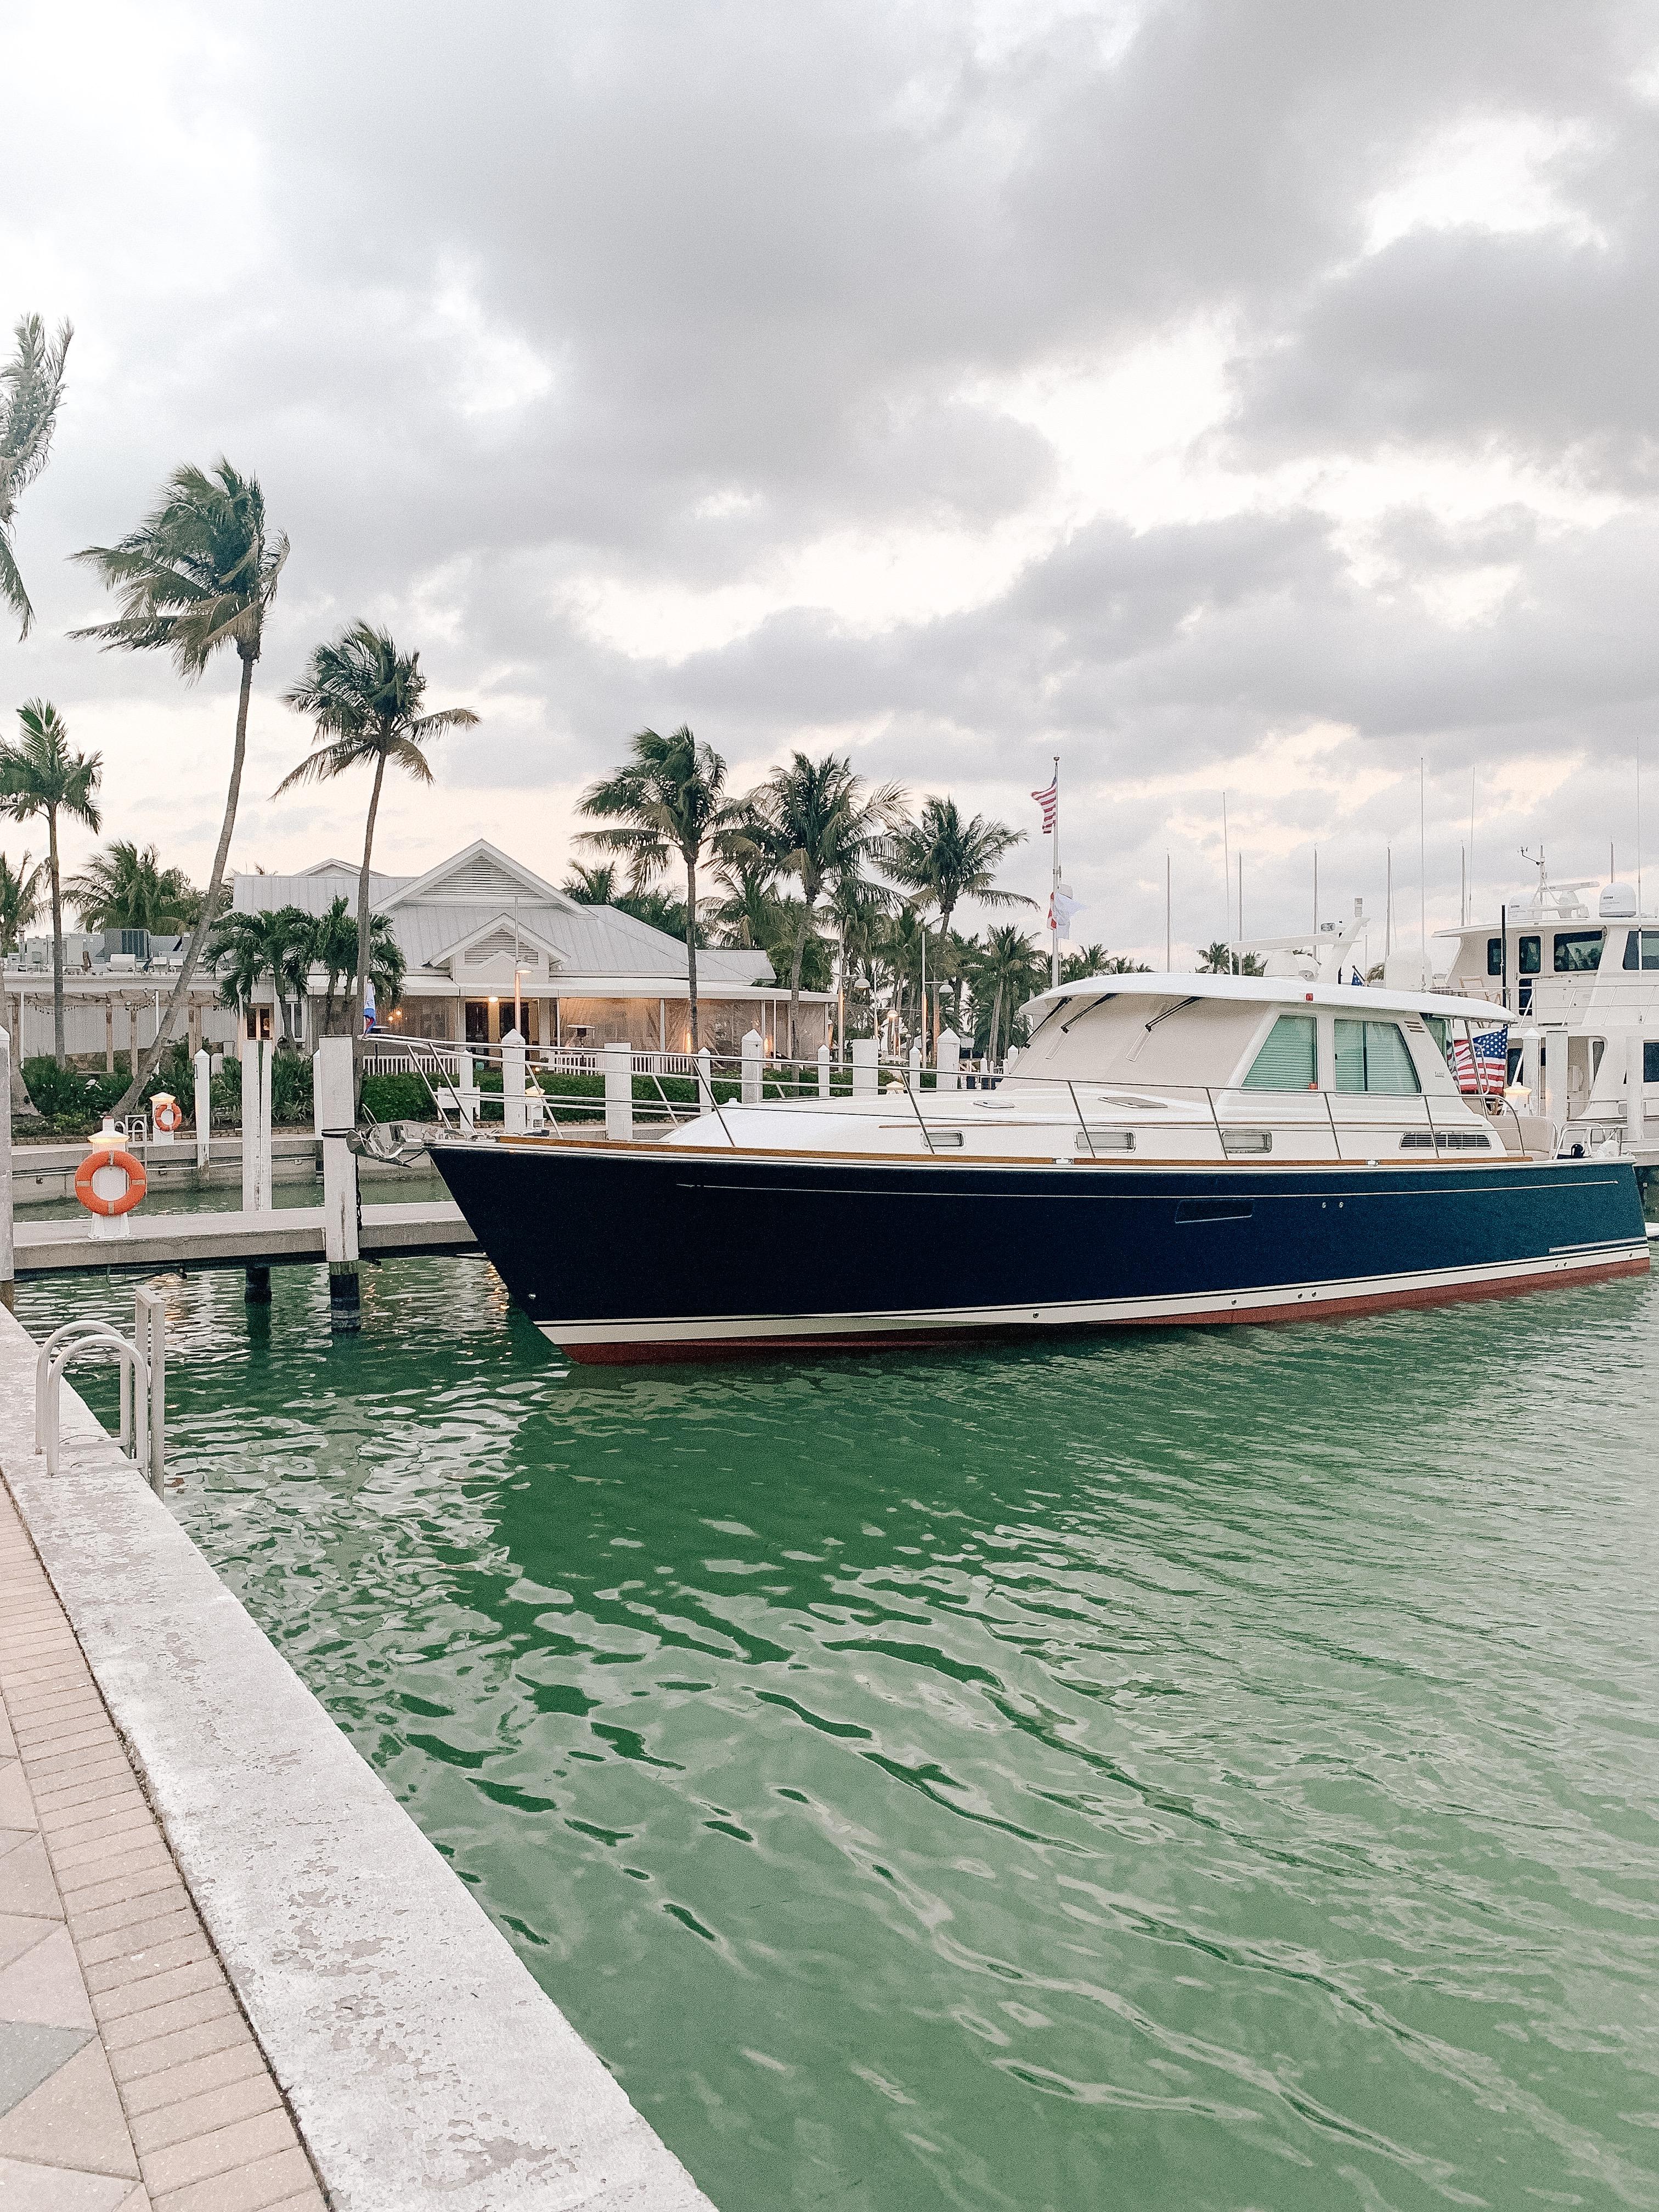 Guide to Captiva, Florida - boat